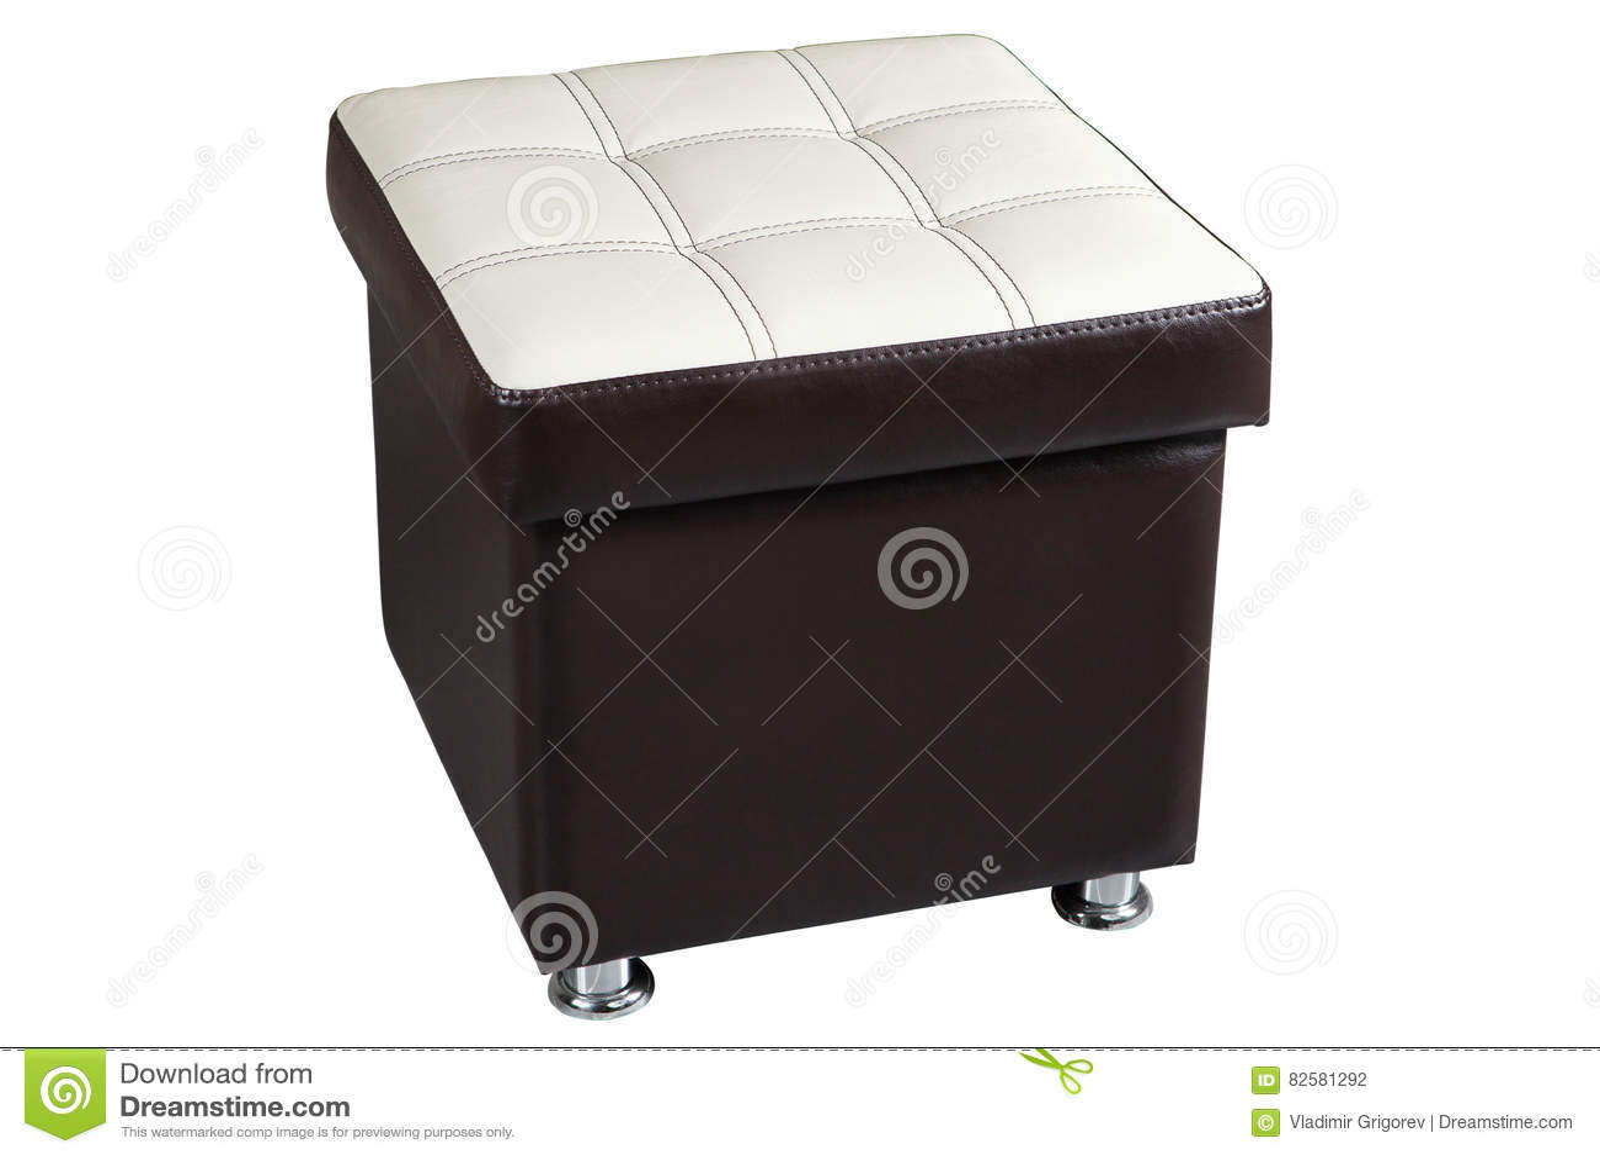 kitchen banquettes for sale black bench table 与白色上面的黑暗的人造皮无背长椅椅子位子库存照片 图片包括有用餐 与白色上面的黑暗的人造皮无背长椅椅子位子